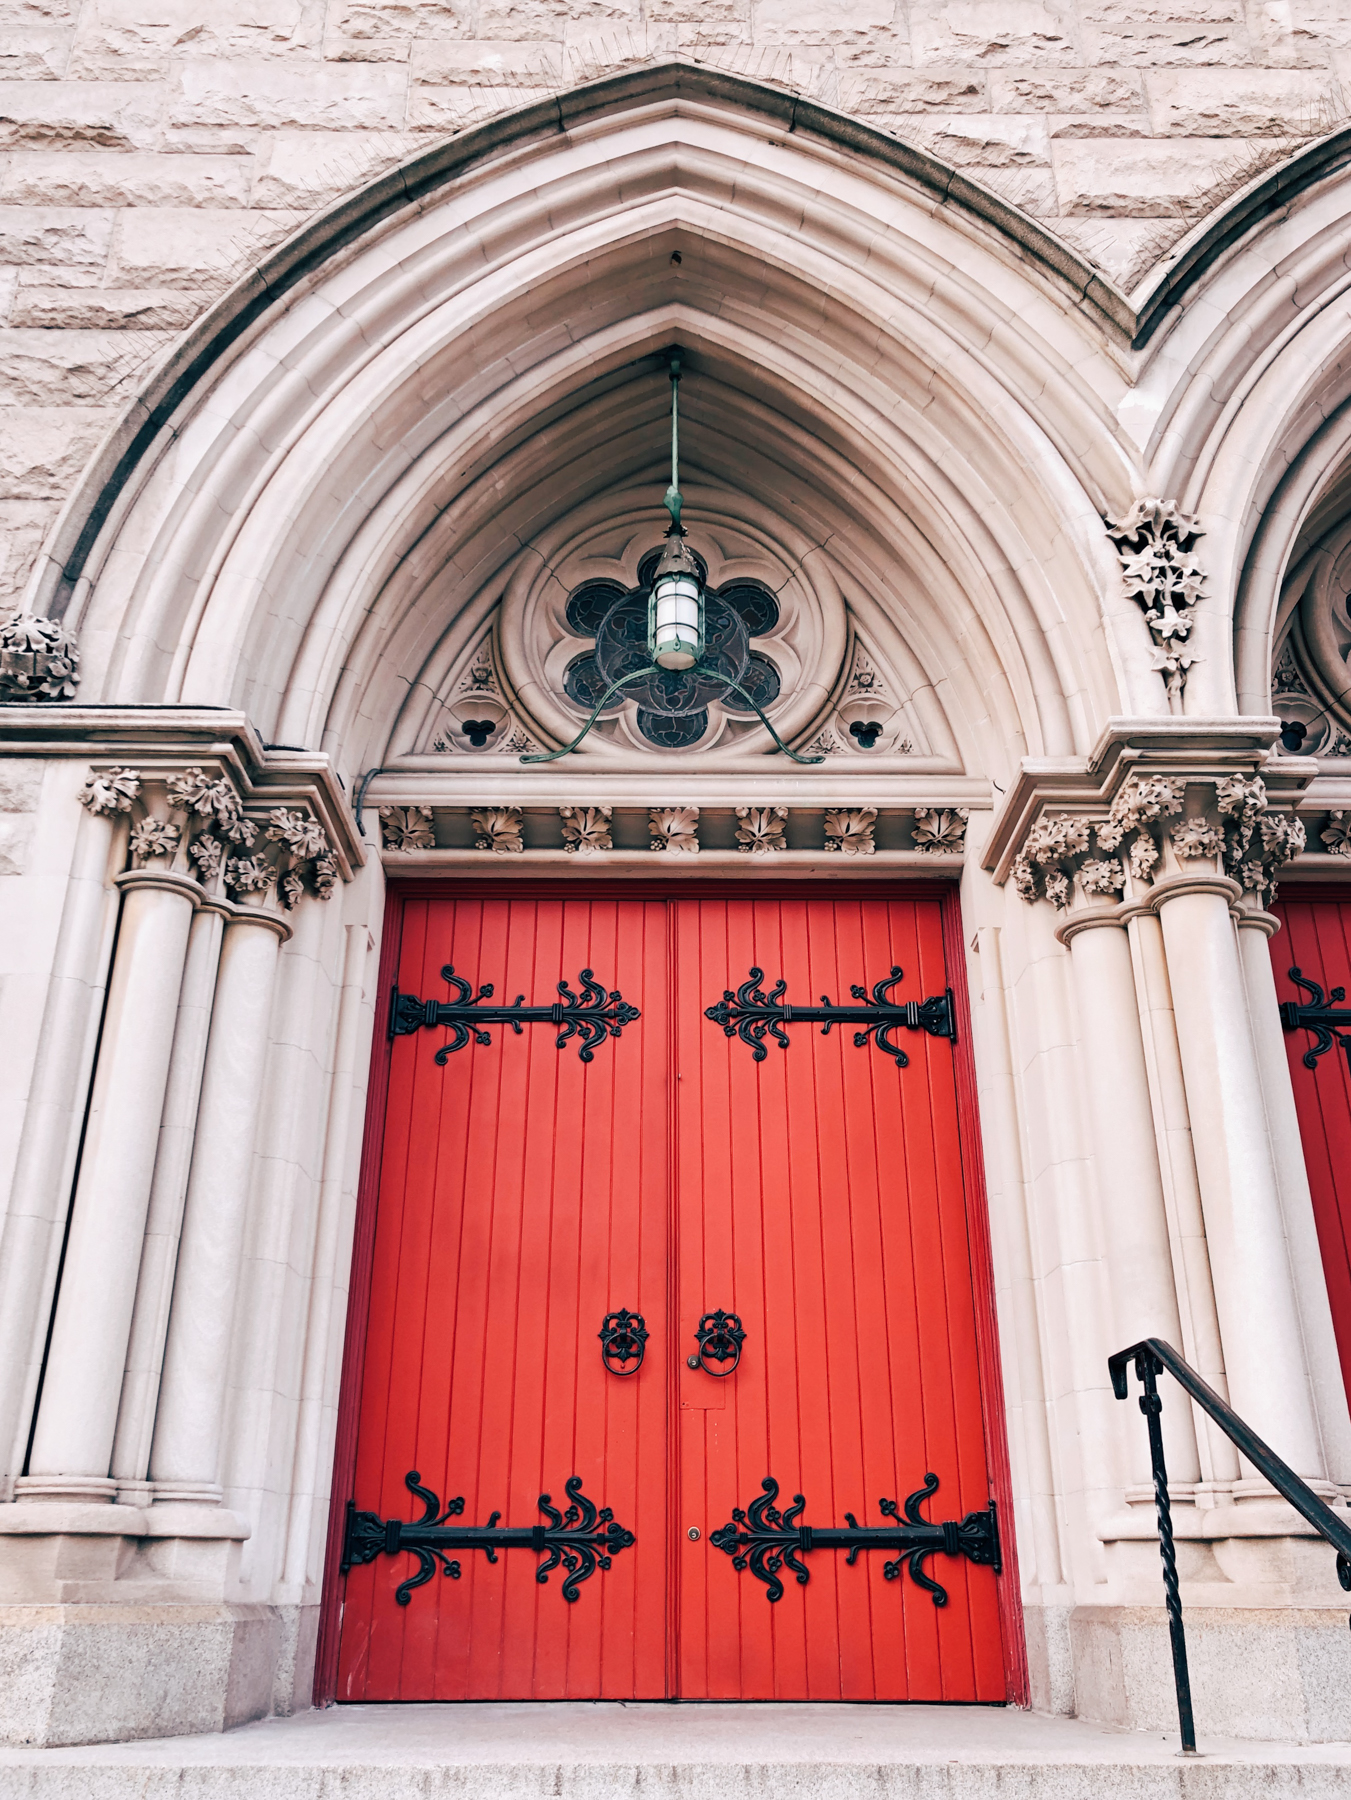 The doors of Holy Trinity Lutheran Church